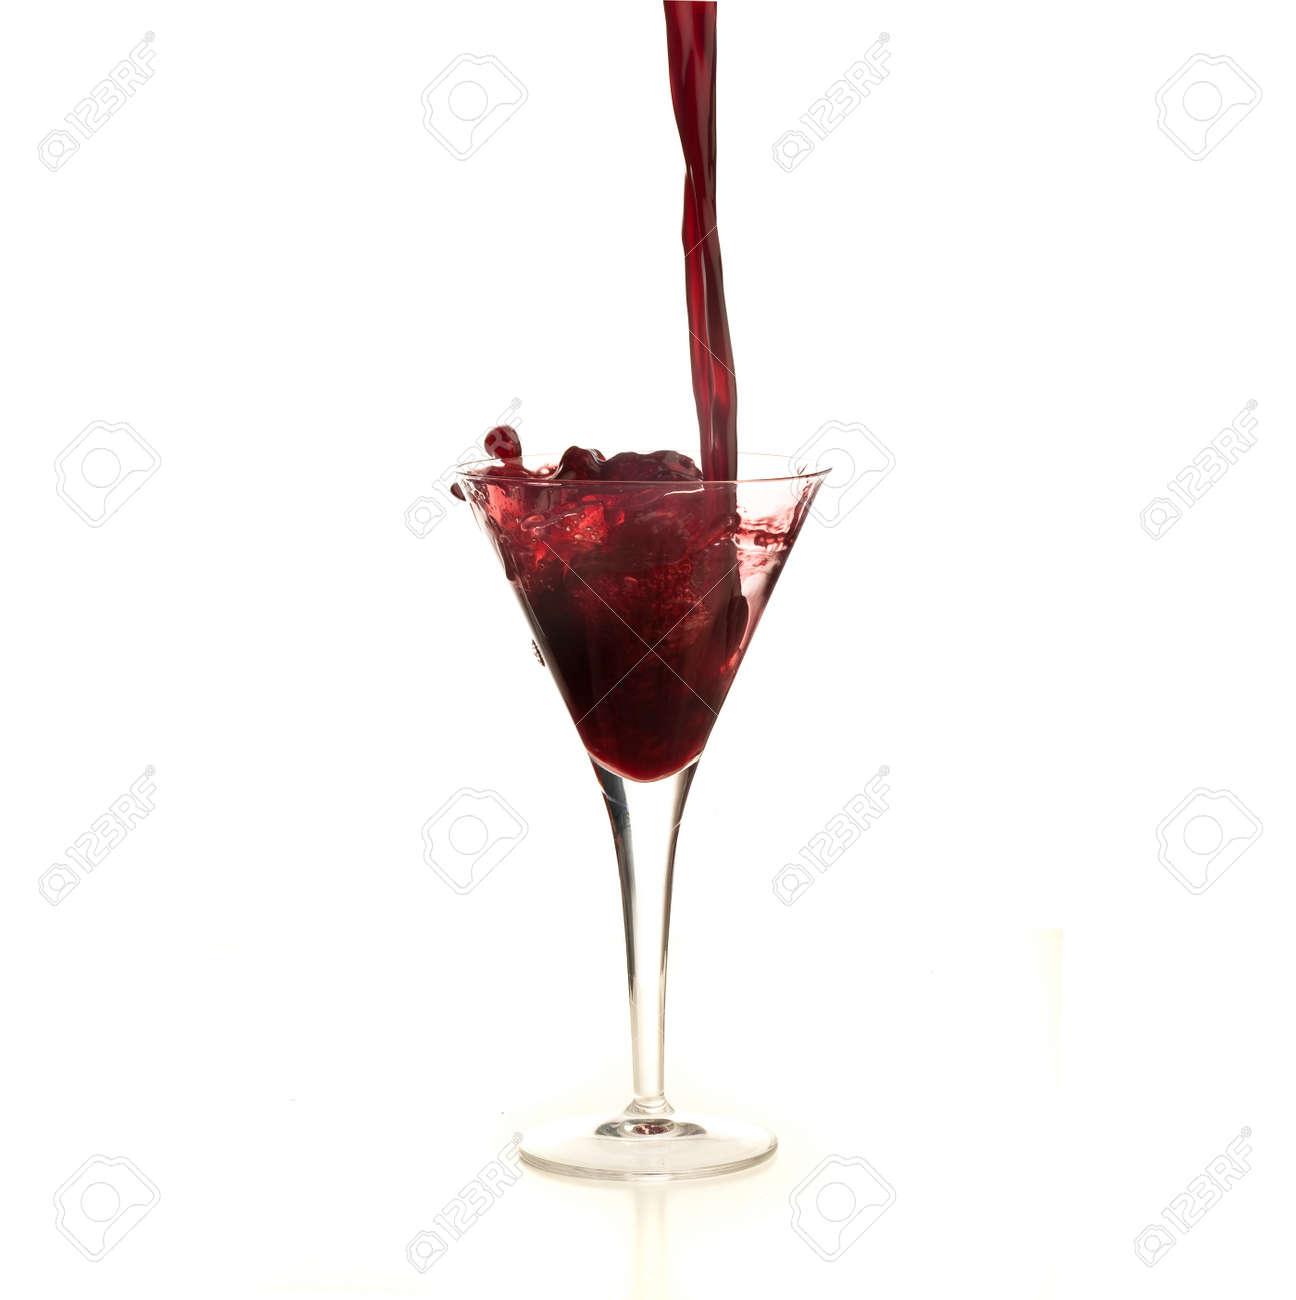 pouring wine Stock Photo - 7892231